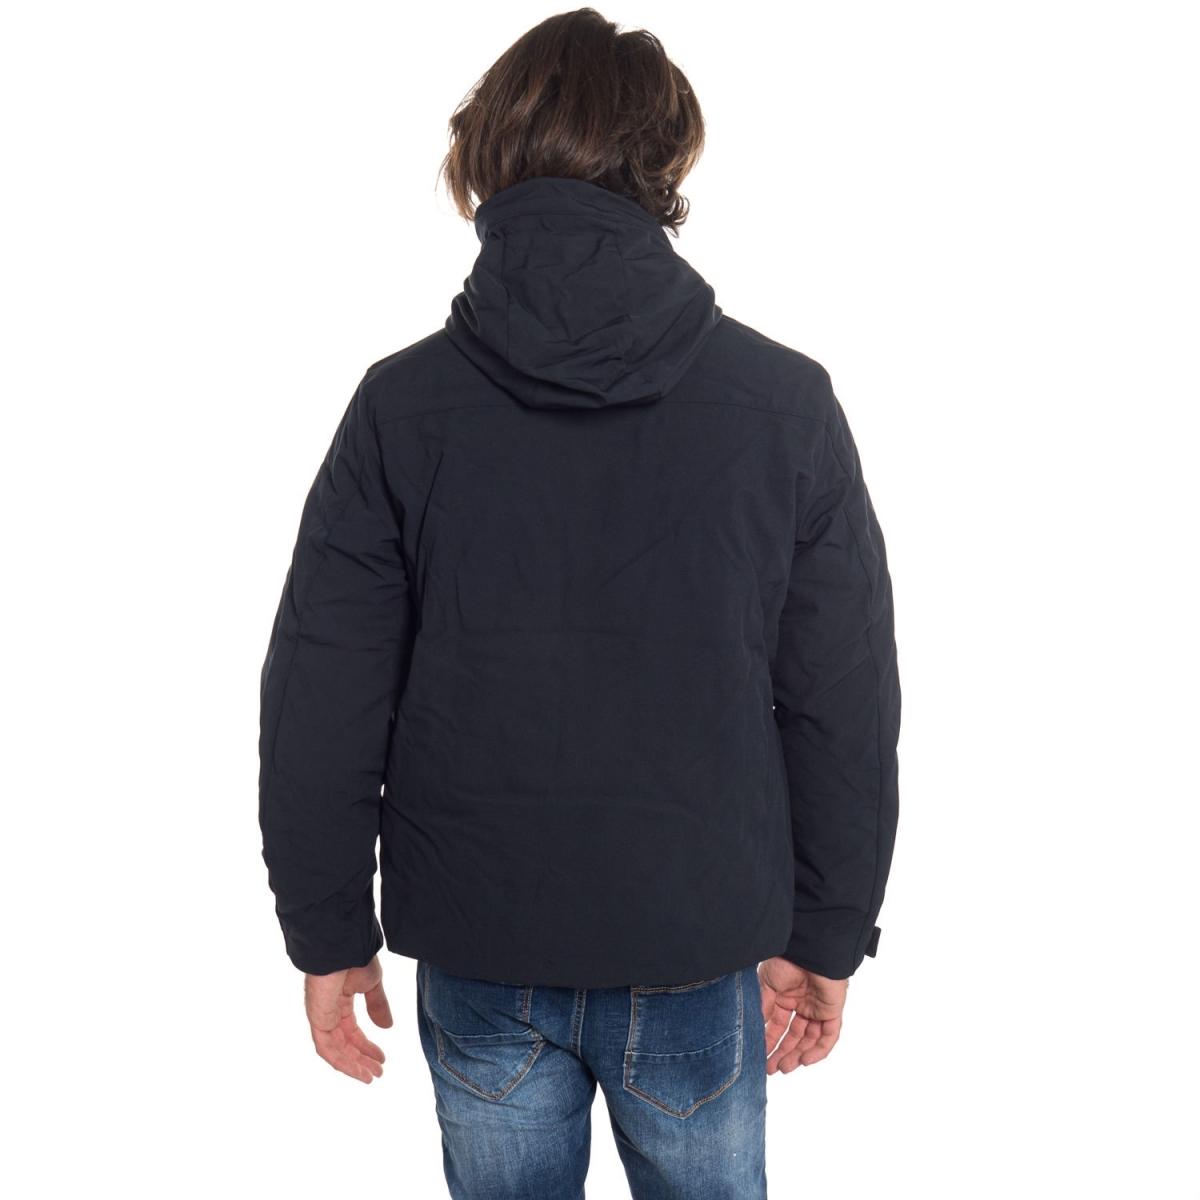 clothing Jackets men Giubbino LPBBK29005 LANDEK PARK Cafedelmar Shop